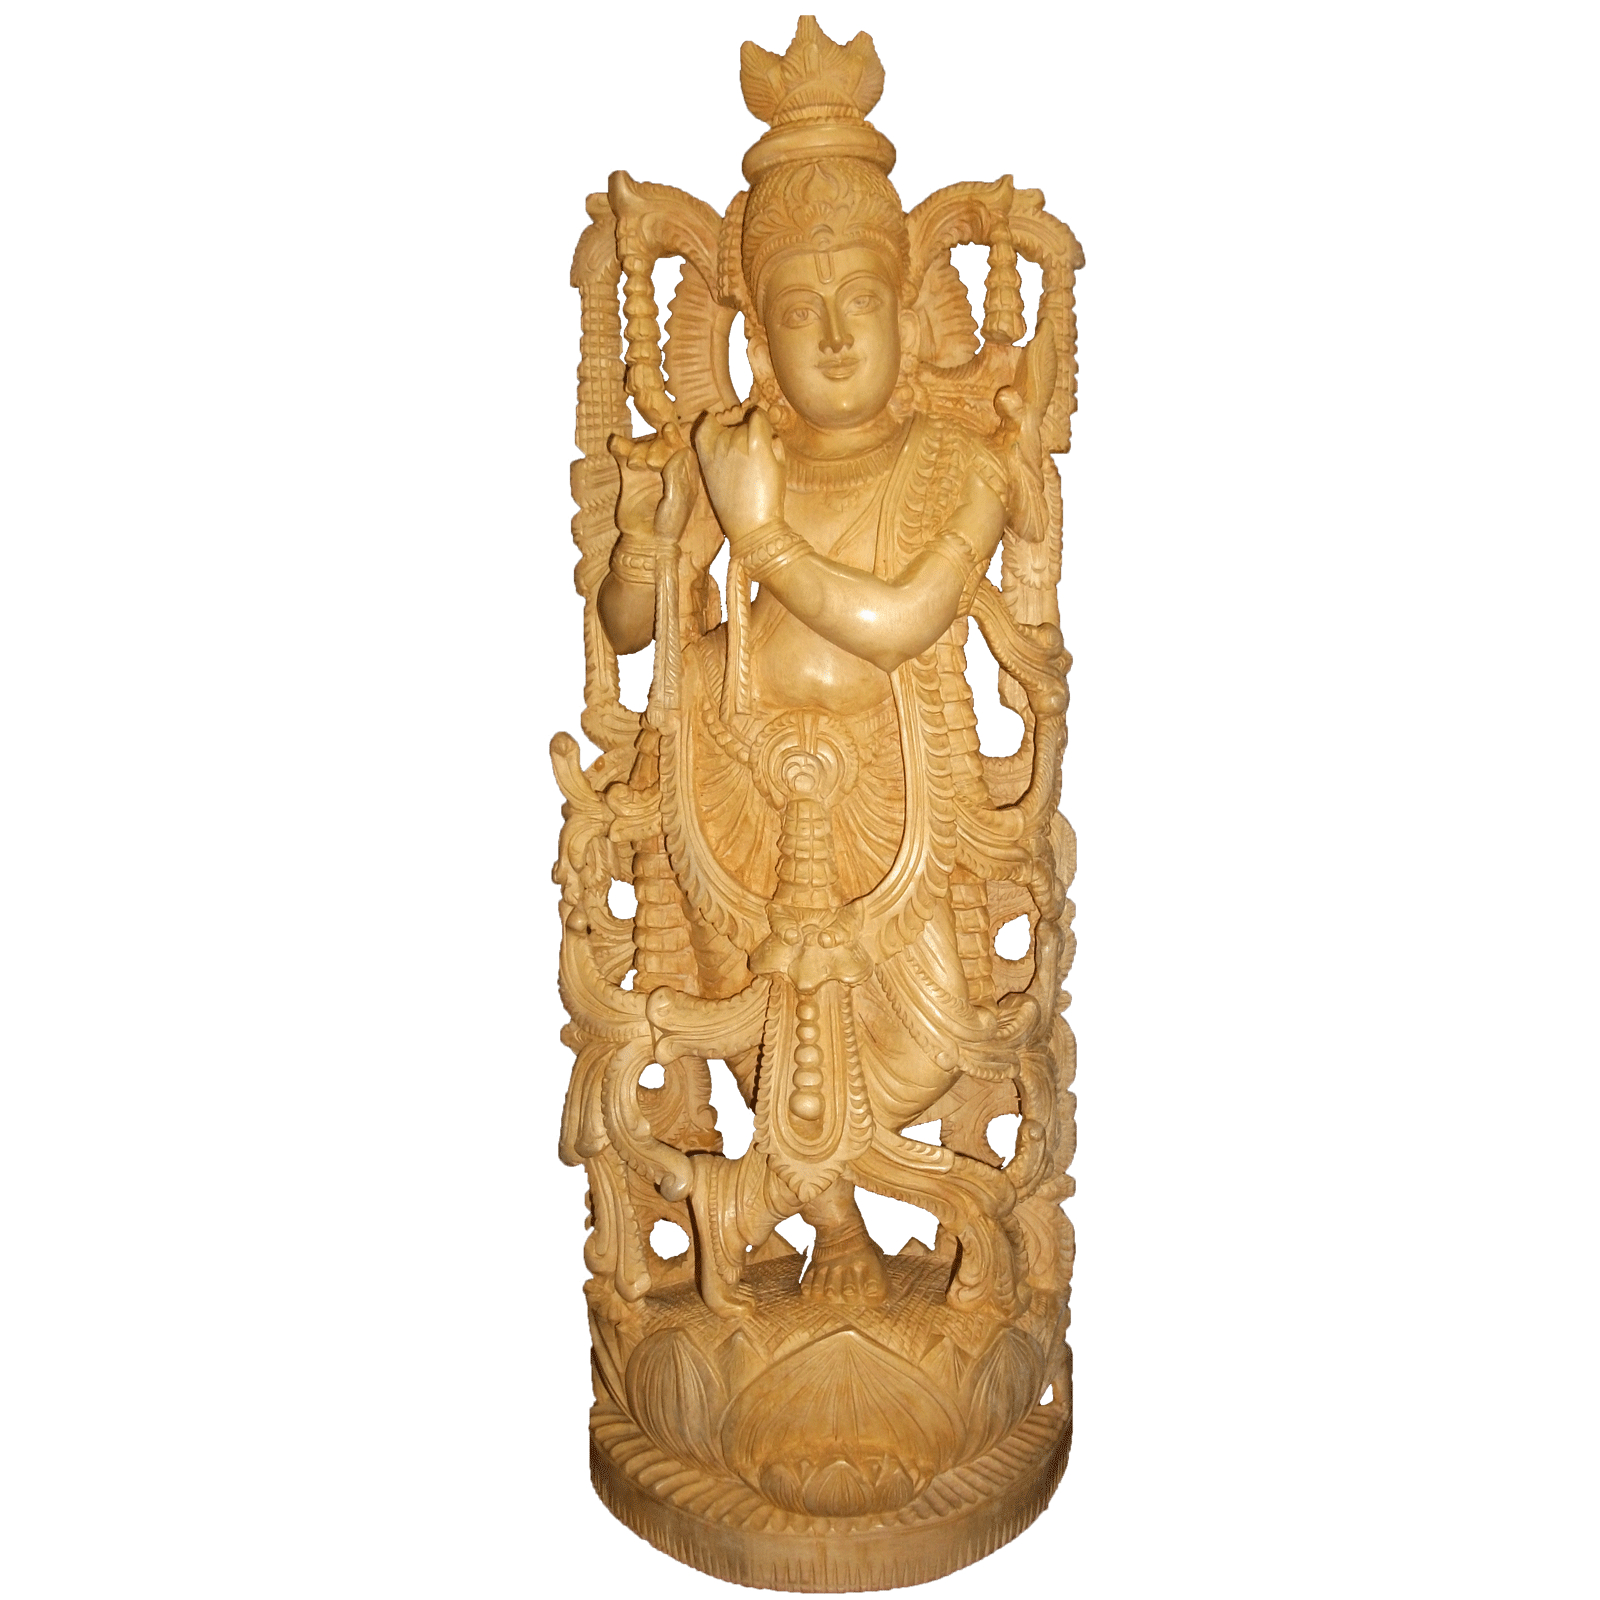 Sri krishna standing position wooden statue